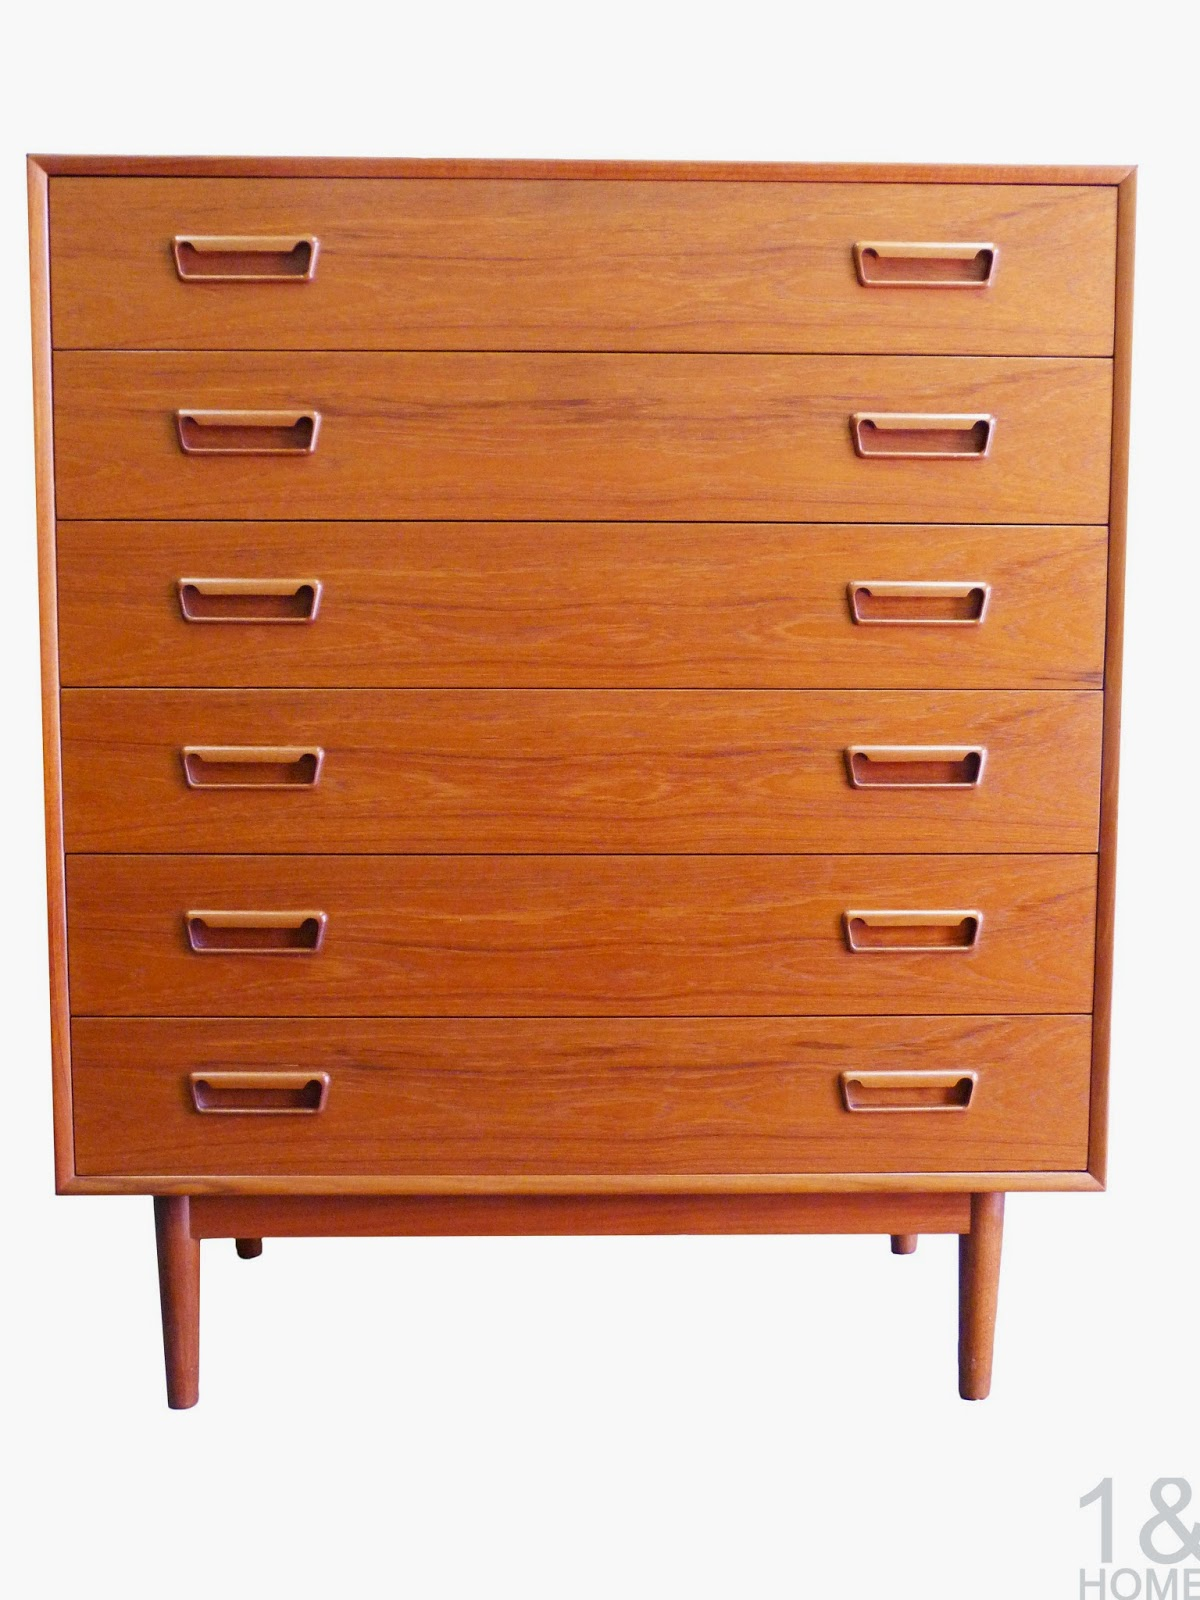 Westnofa Danish Modern Mid-Century six drawer dresser chest